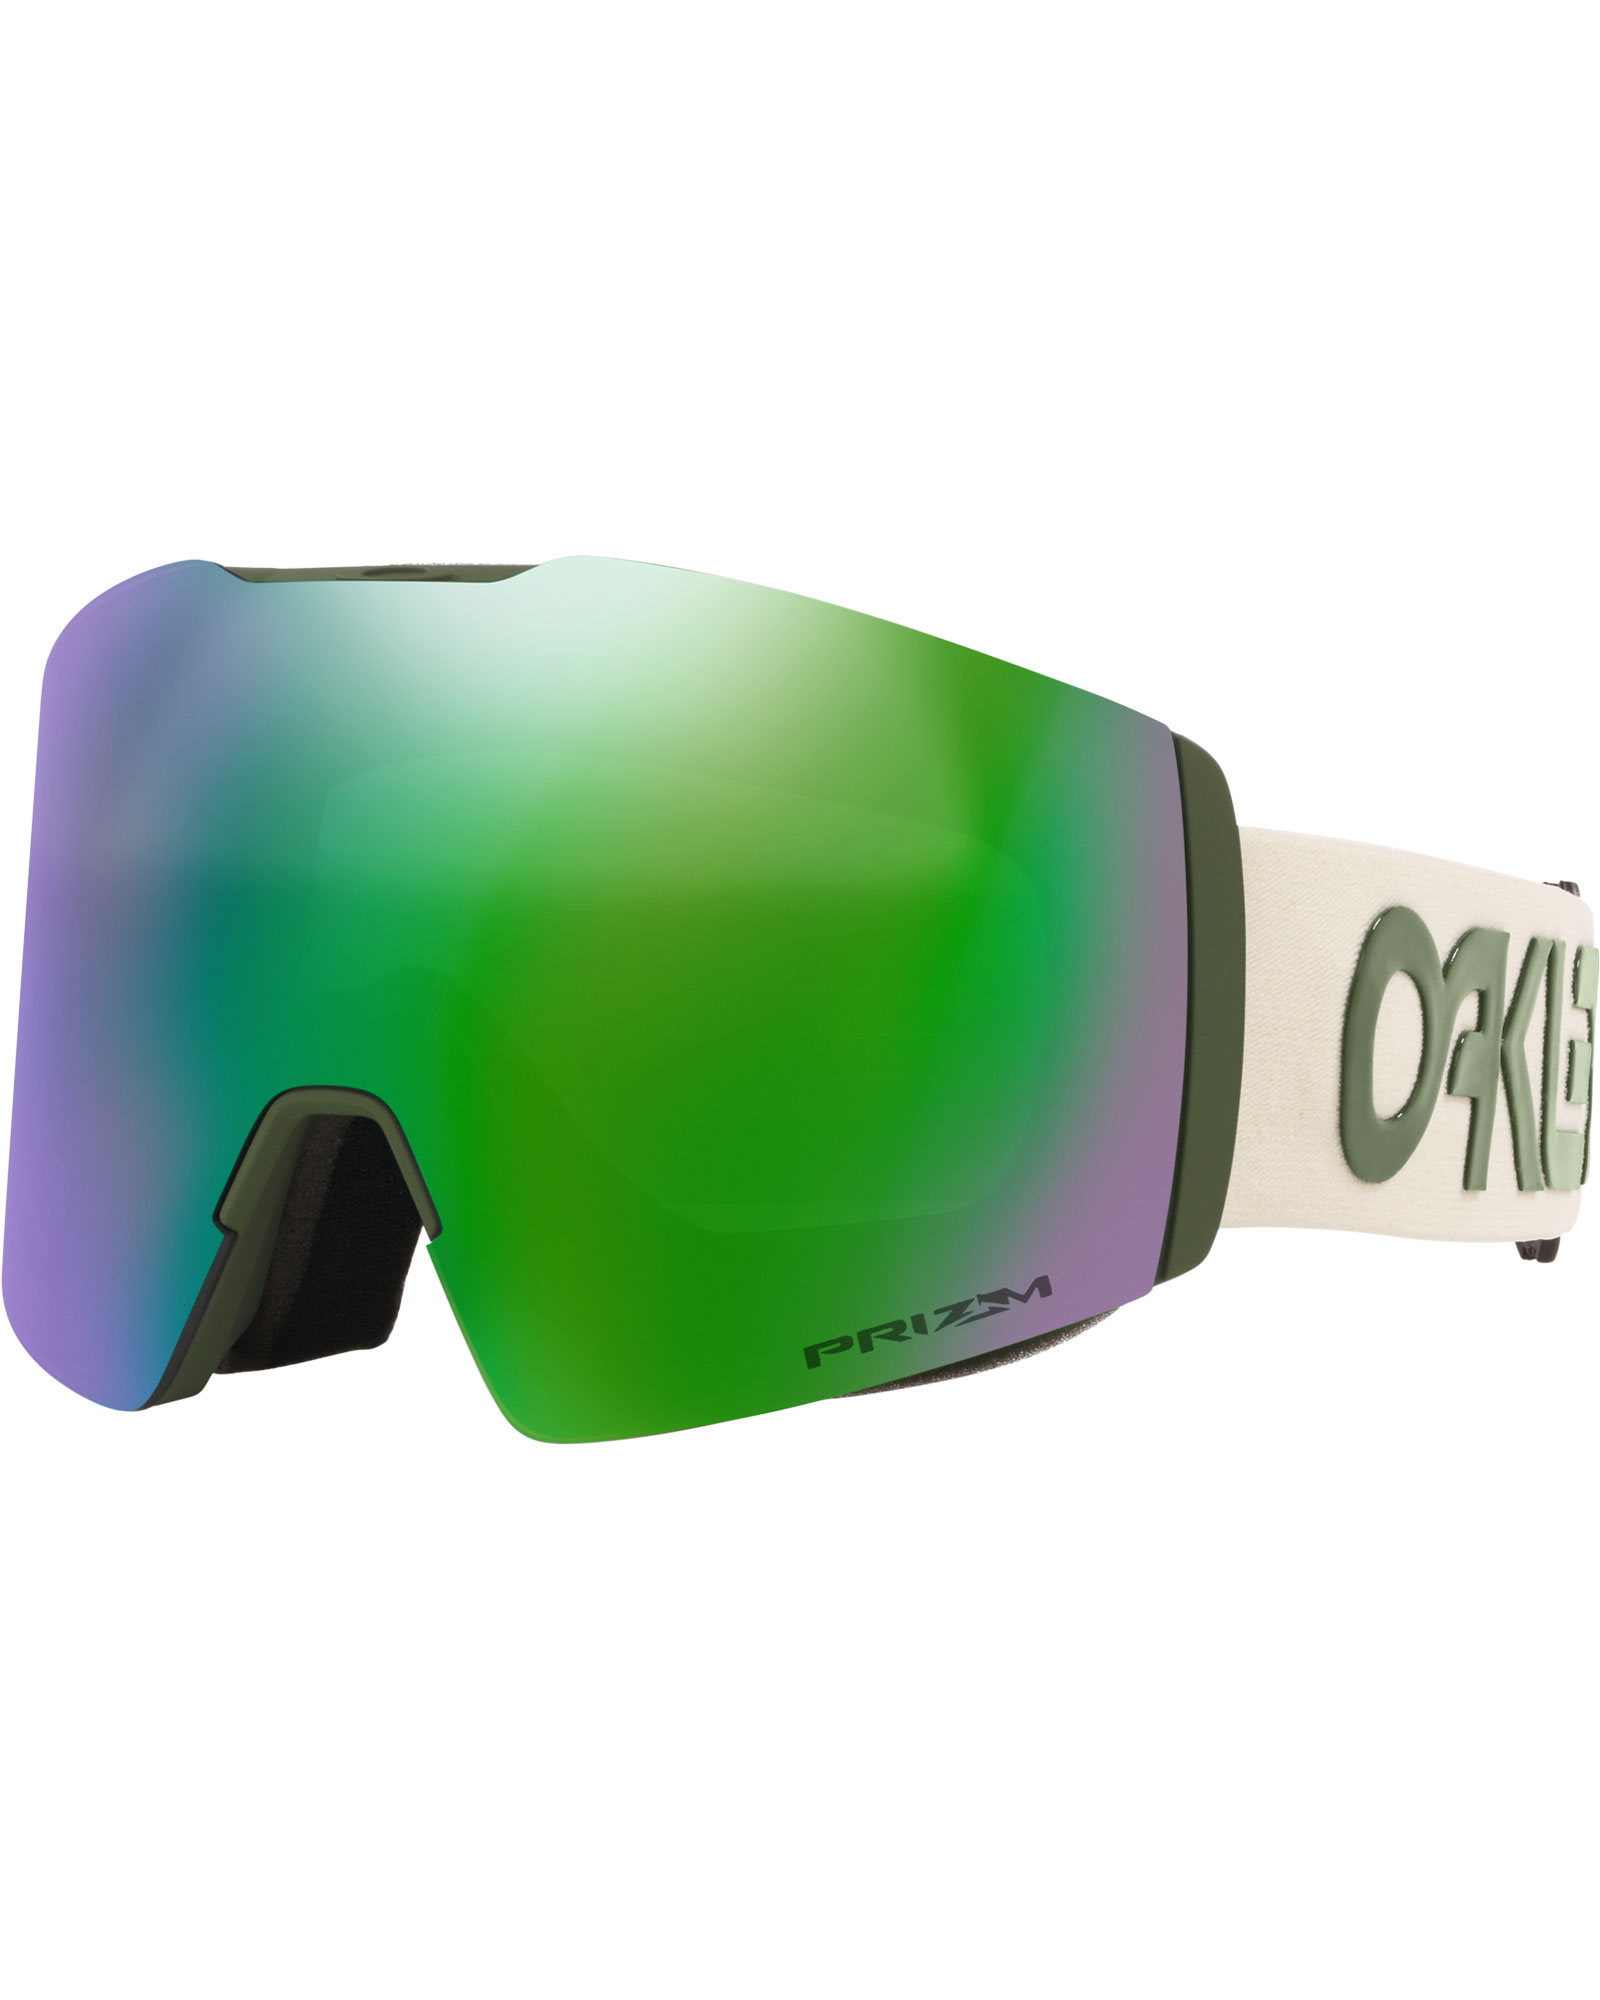 Oakley Fall Line XL Factory Pilot Dark Brush Grey / Prizm Jade Iridium Goggles 2020 / 2021 0